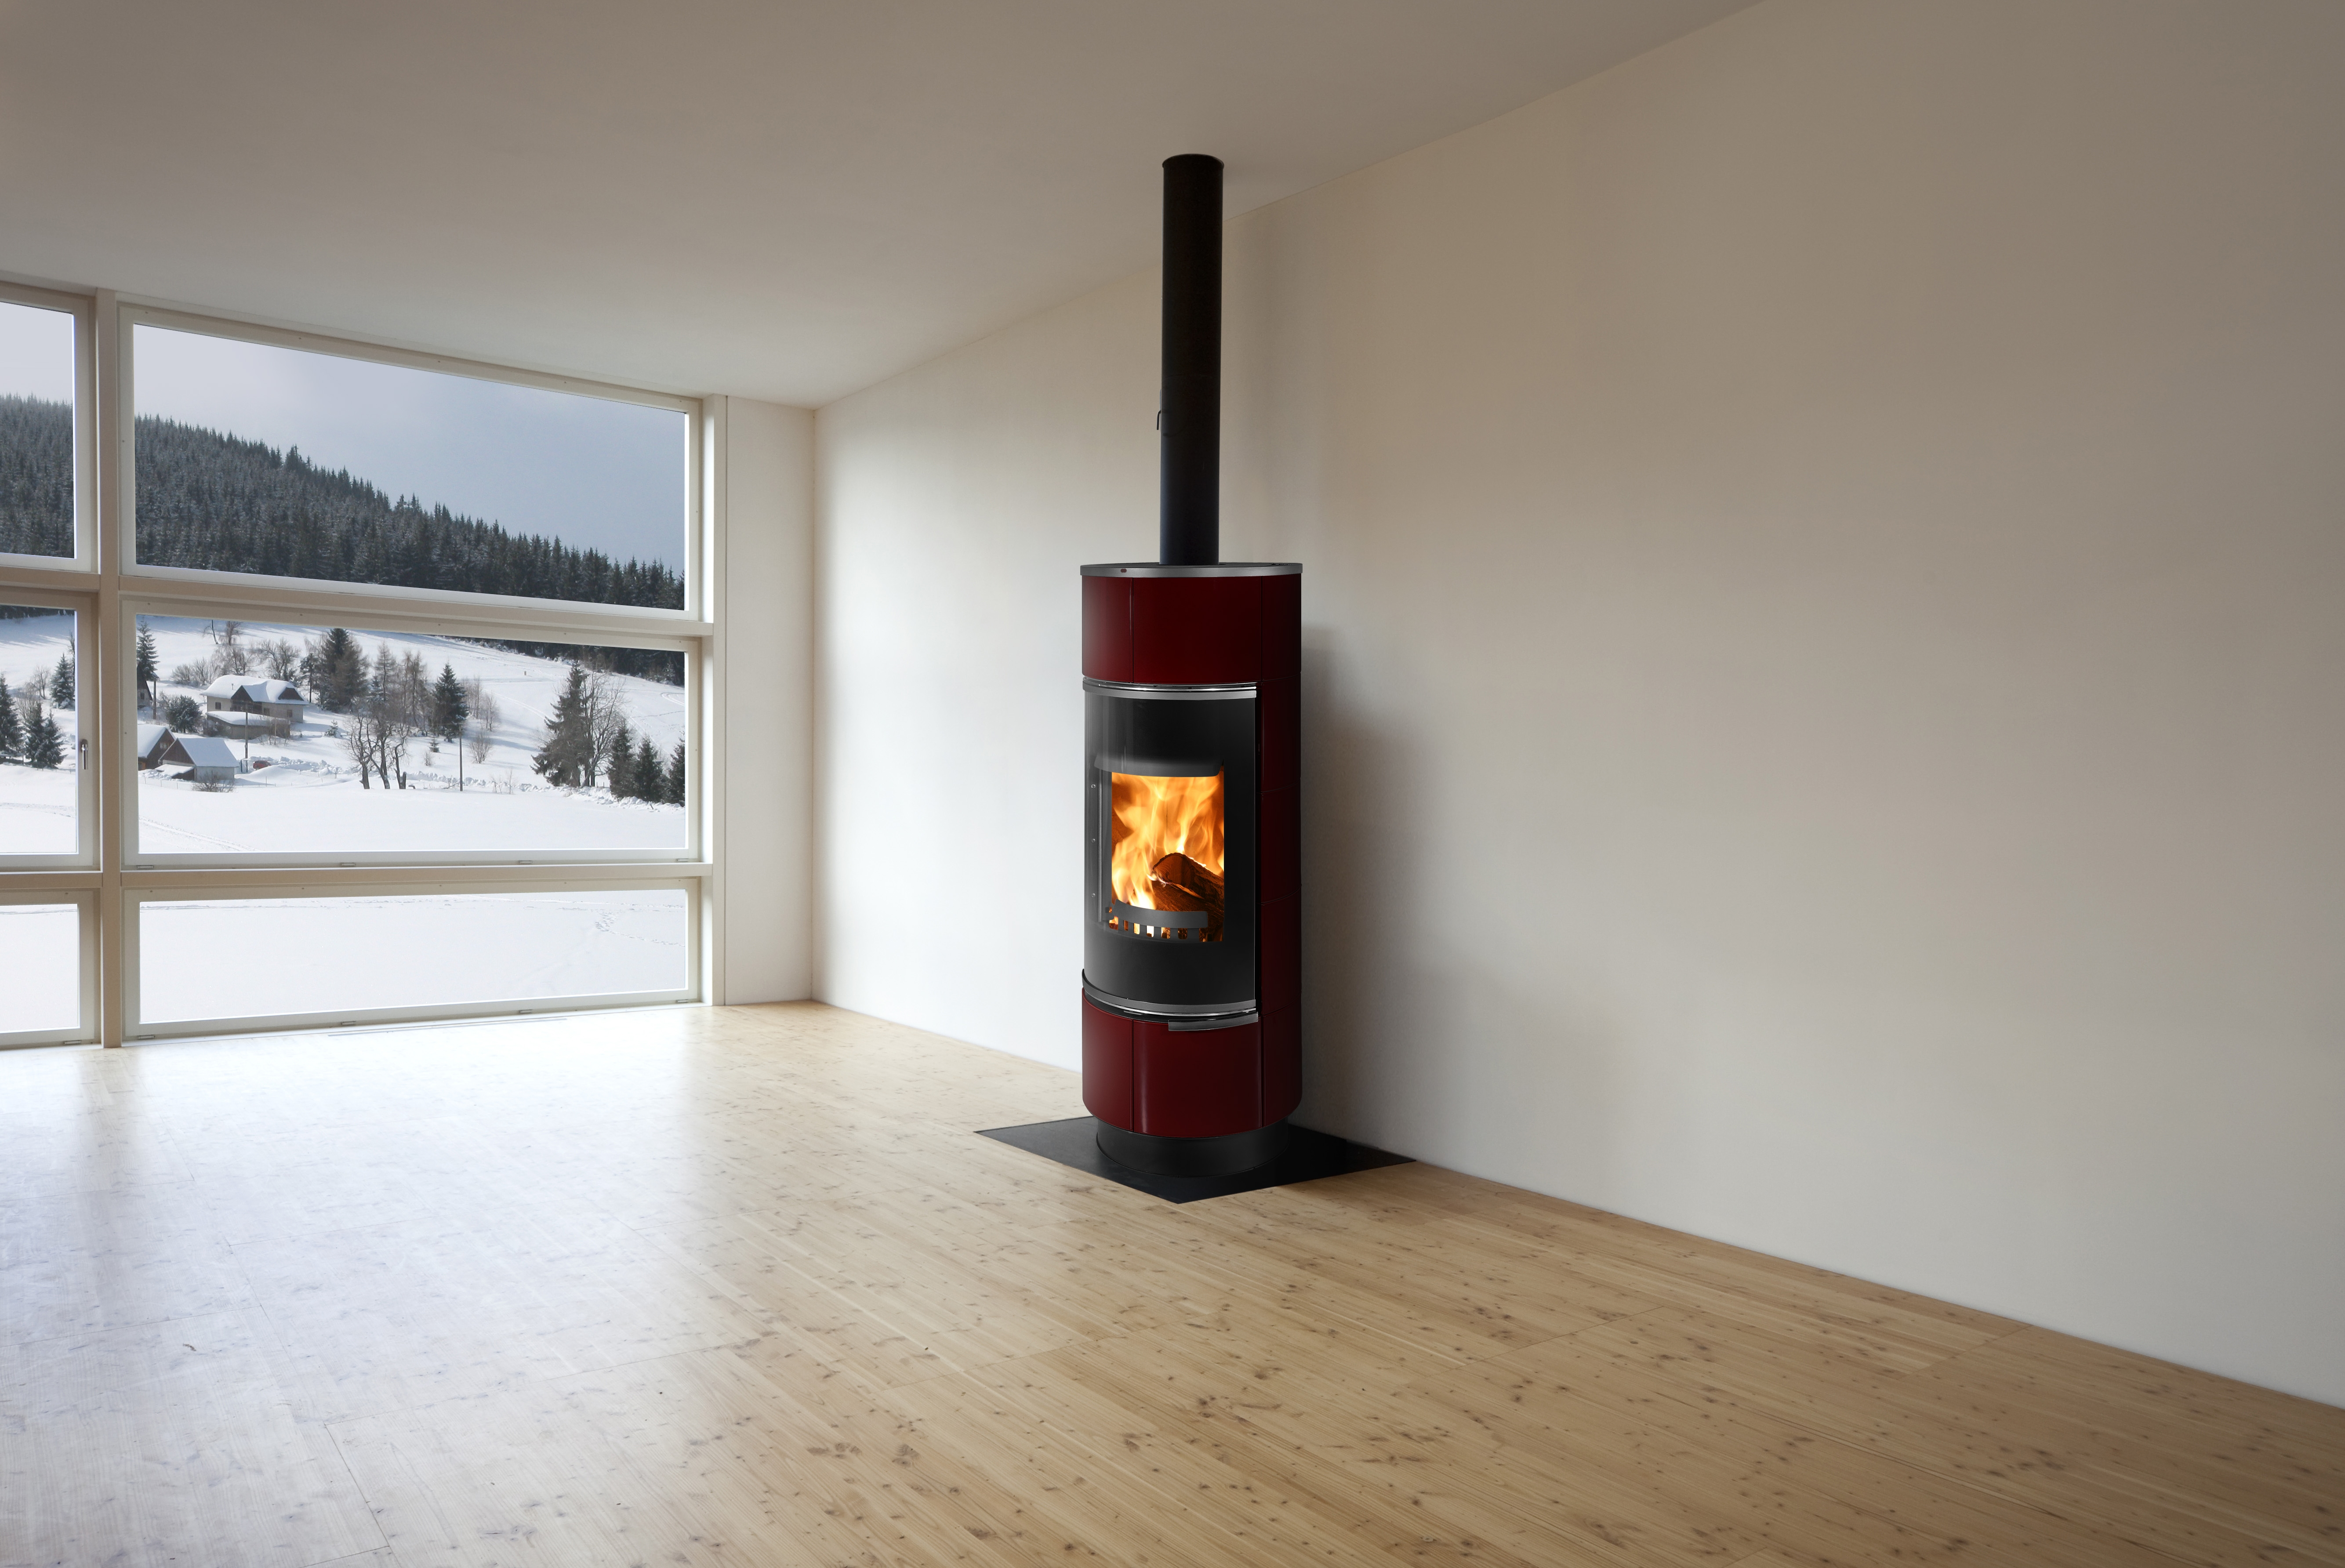 atika po le bois en fa ence thorma france. Black Bedroom Furniture Sets. Home Design Ideas